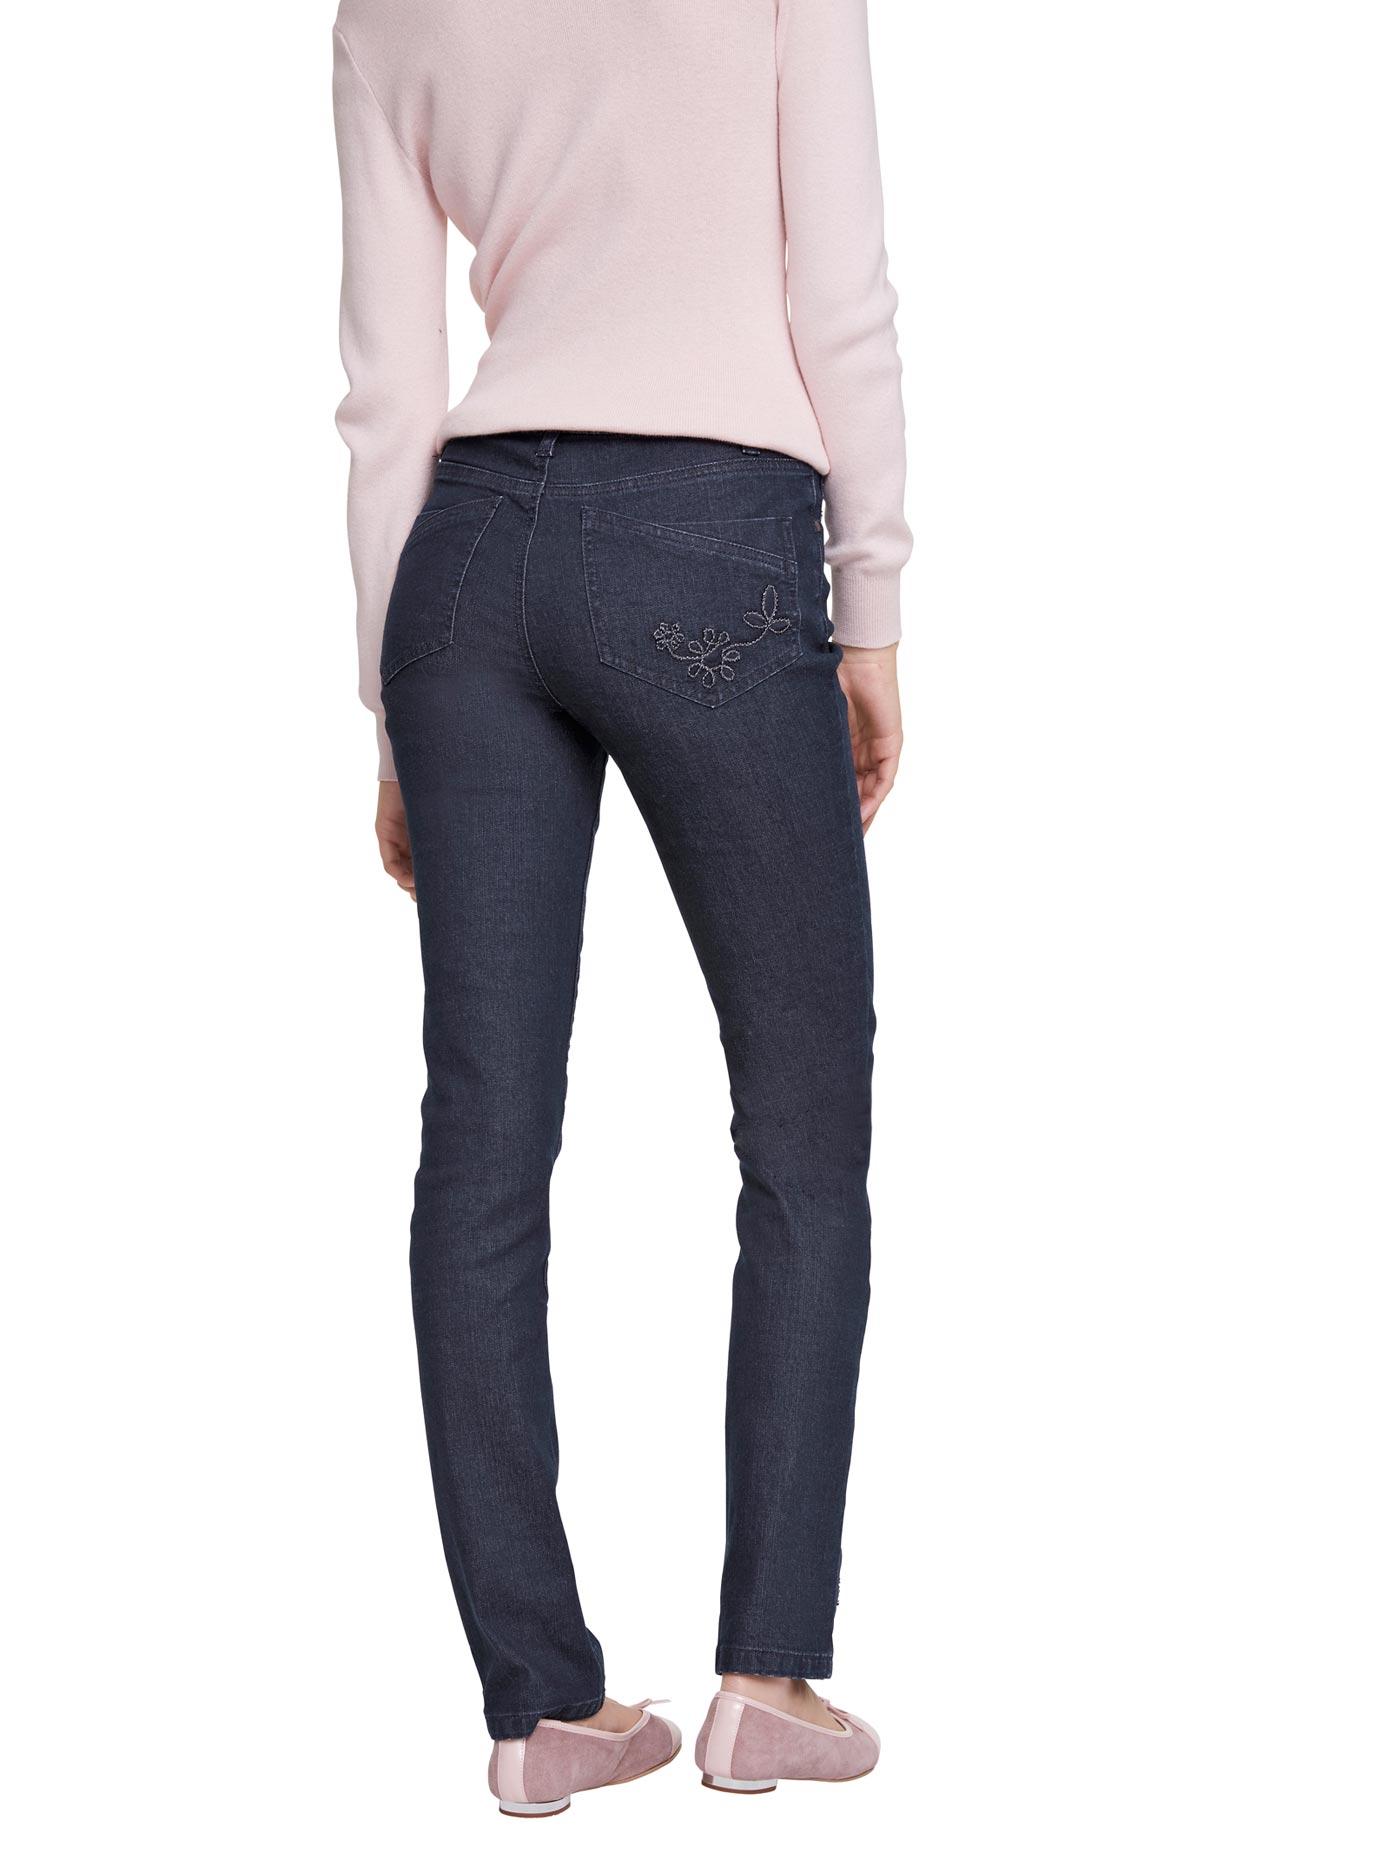 Image of ASHLEY BROOKE by Heine 5-Pocket-Jeans